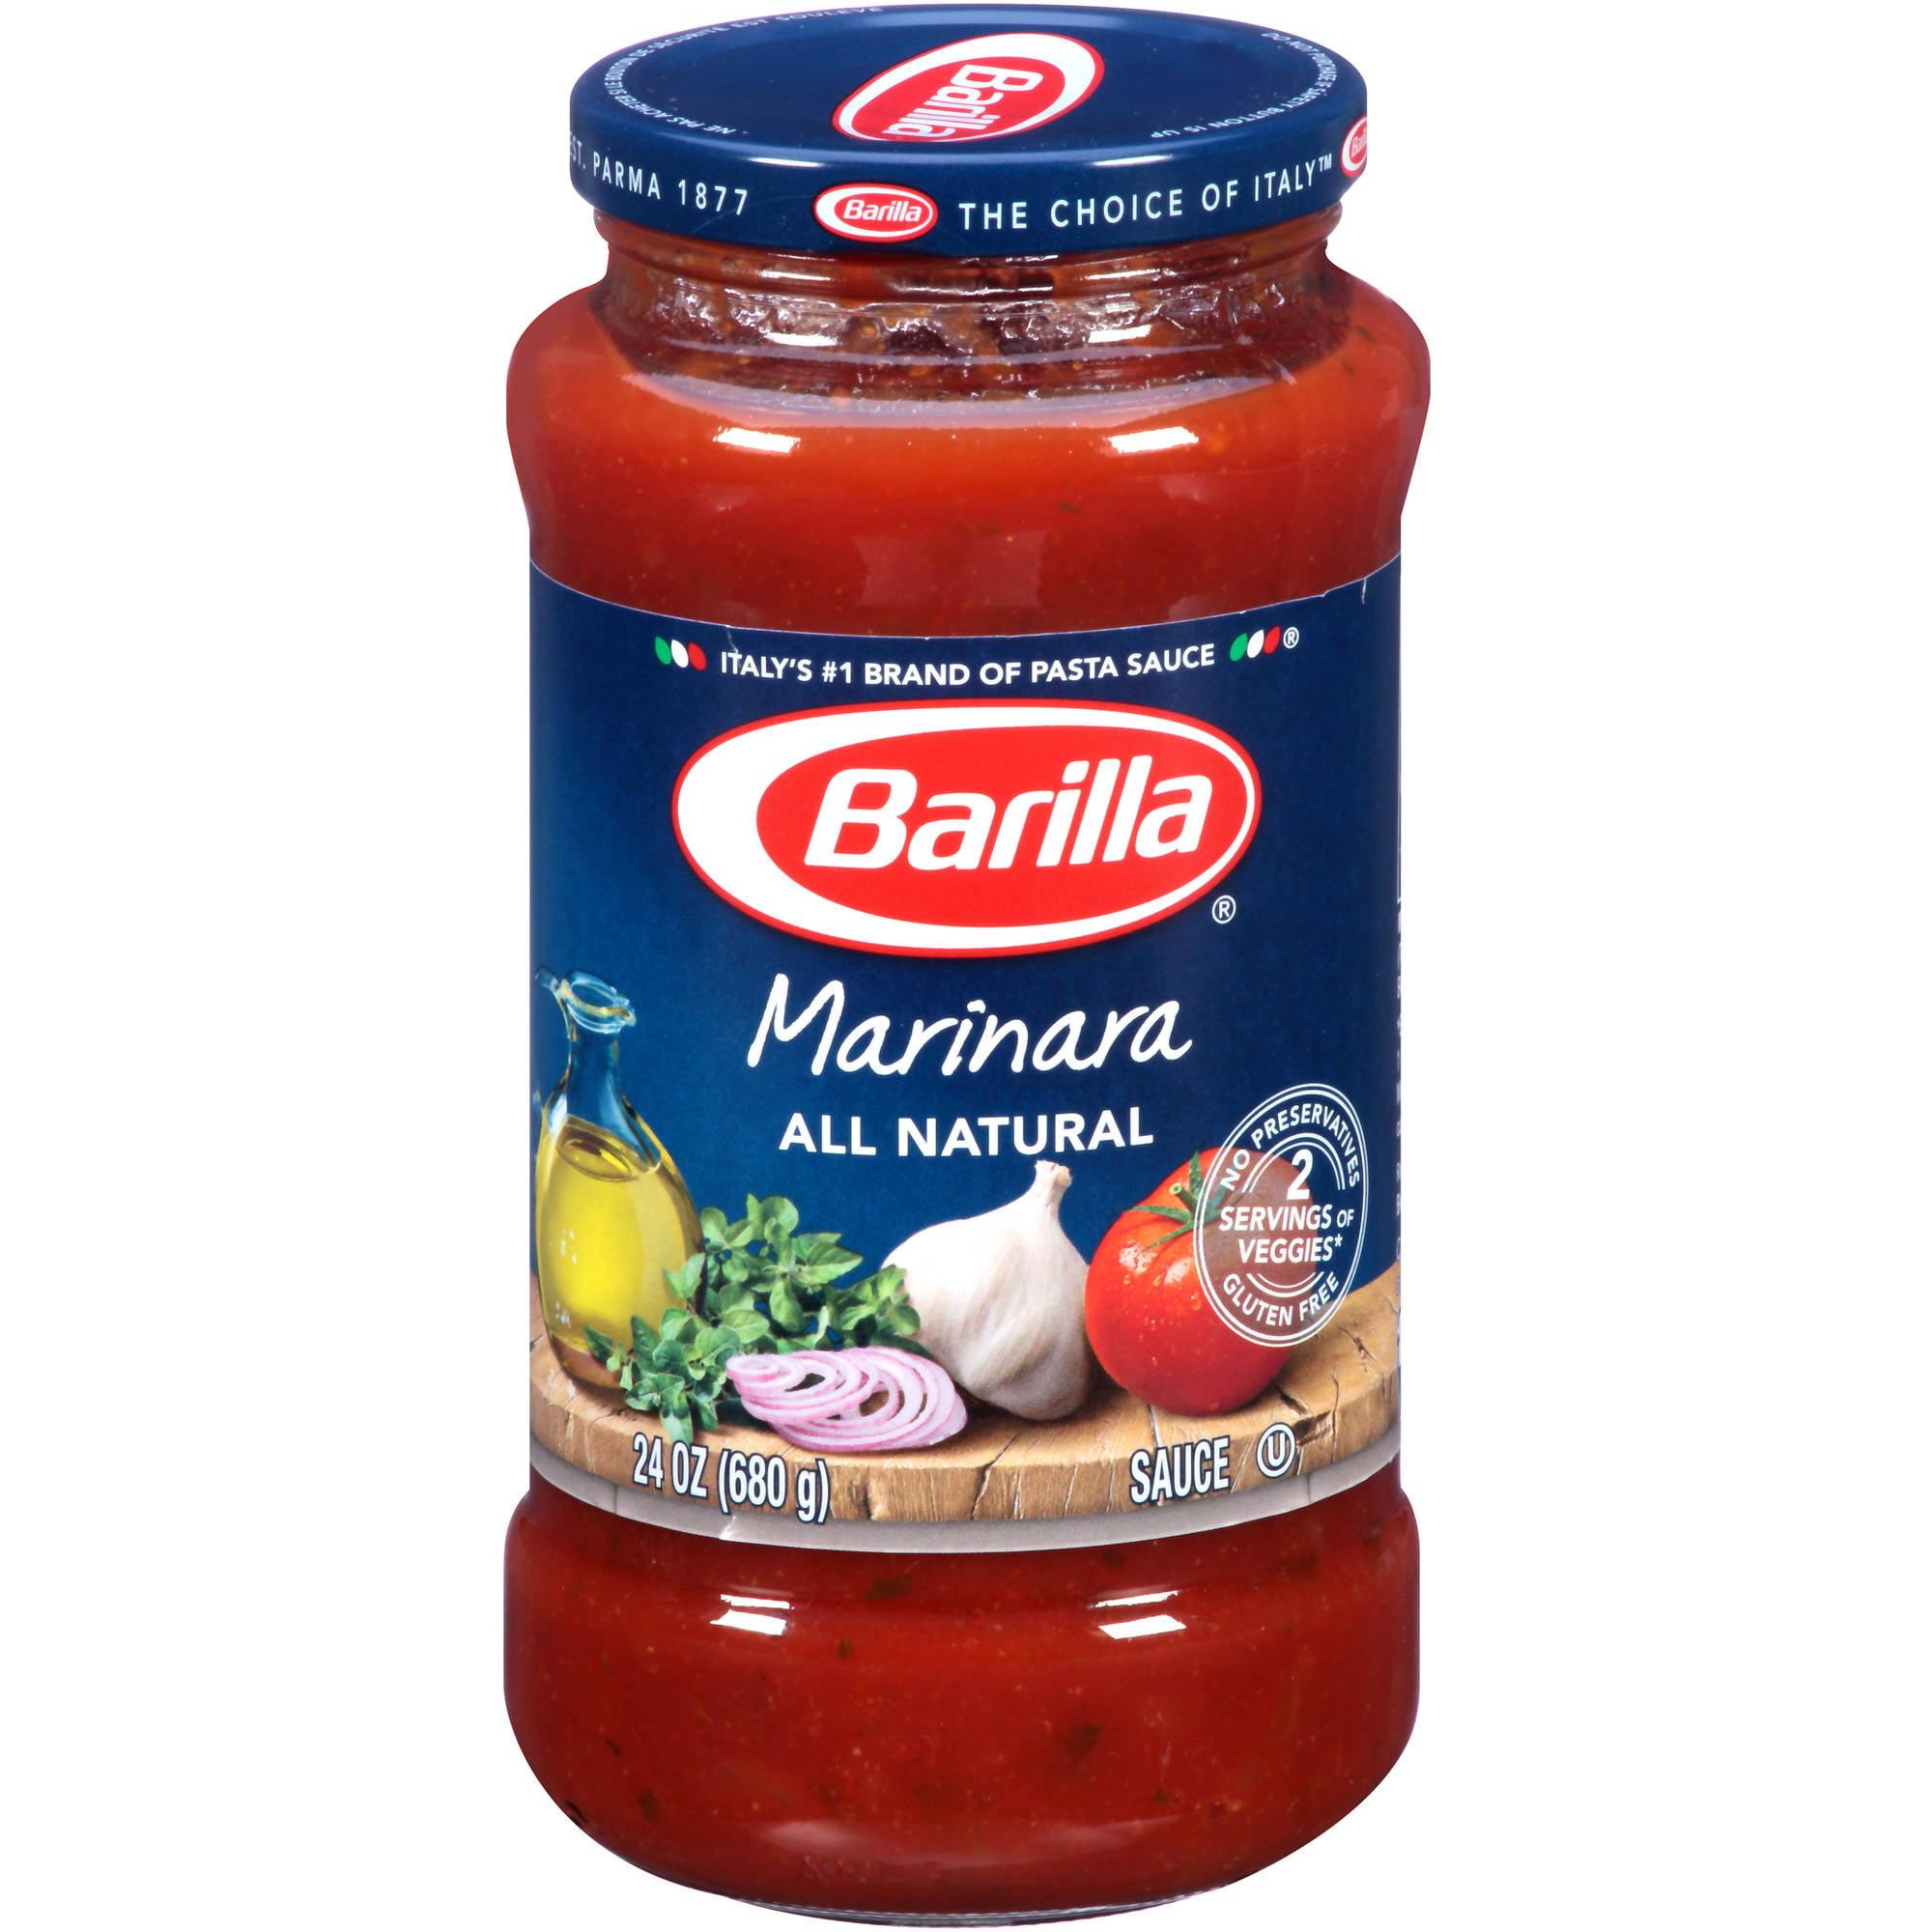 Barilla Marinara Pasta Sauce, 24 oz - Walmart.com